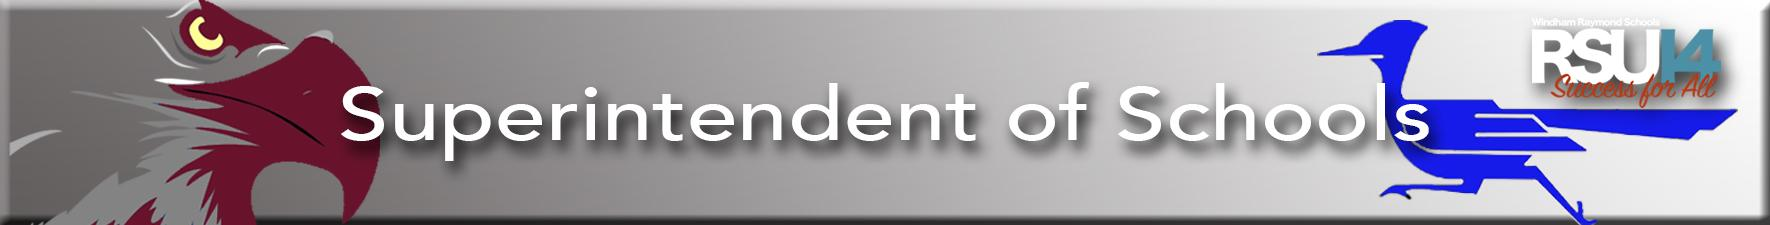 Superintendents Banner